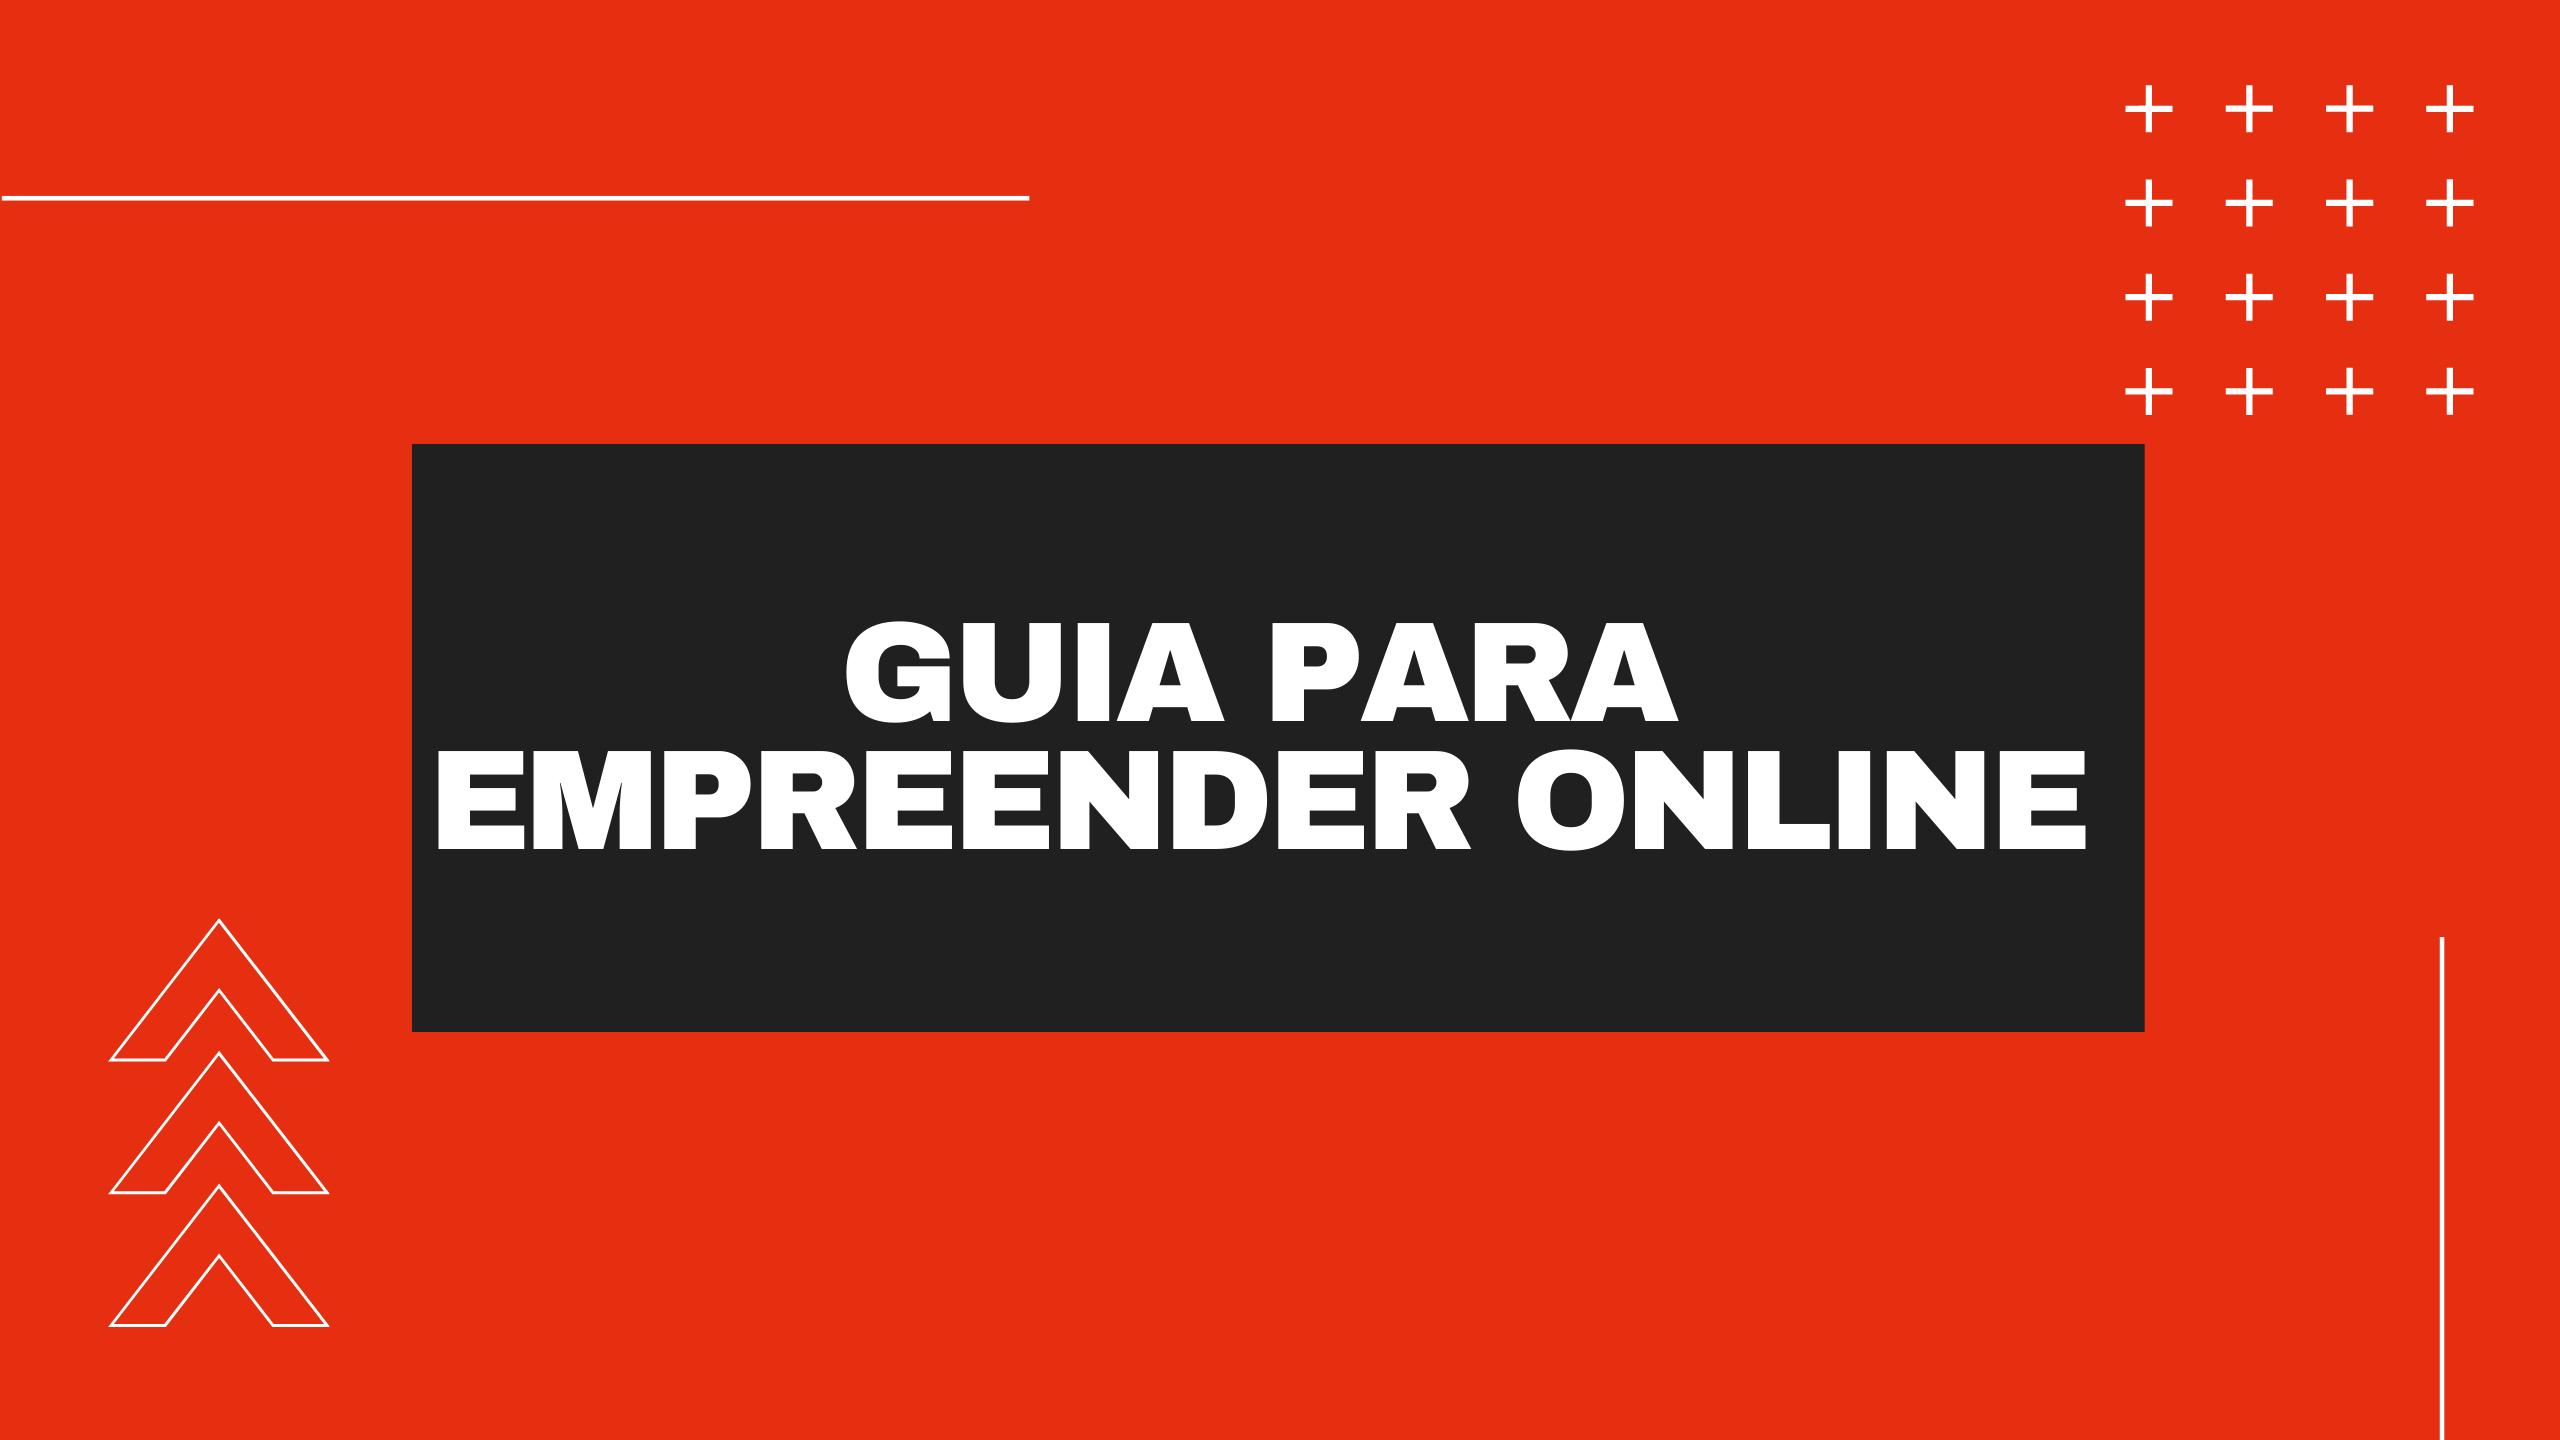 guia para empreender online